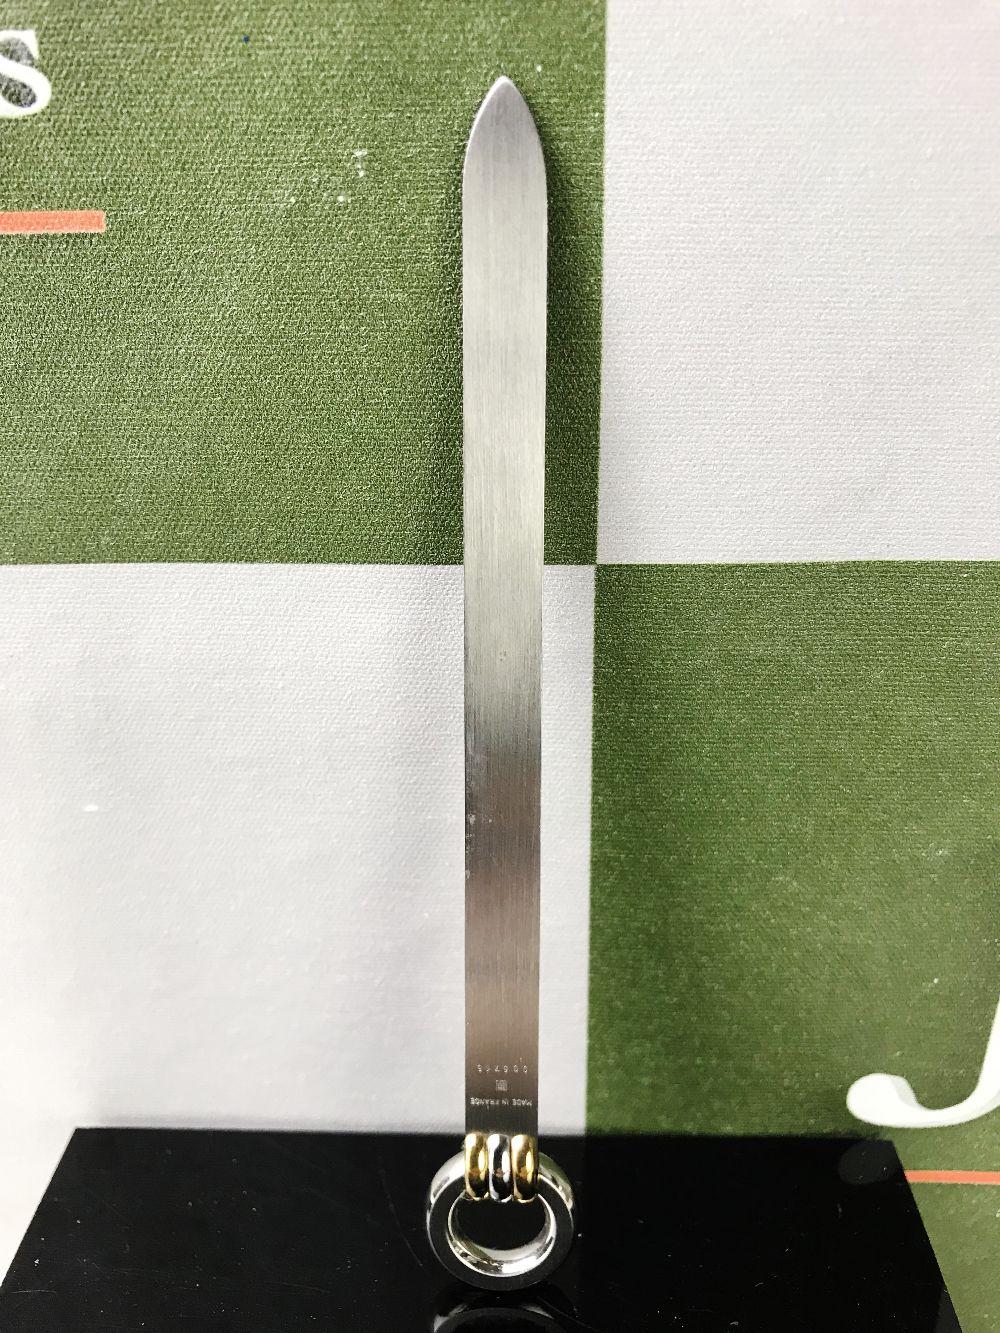 Lot 46 - Cartier Letter Opener, Gold Plated Must de Cartier Edition